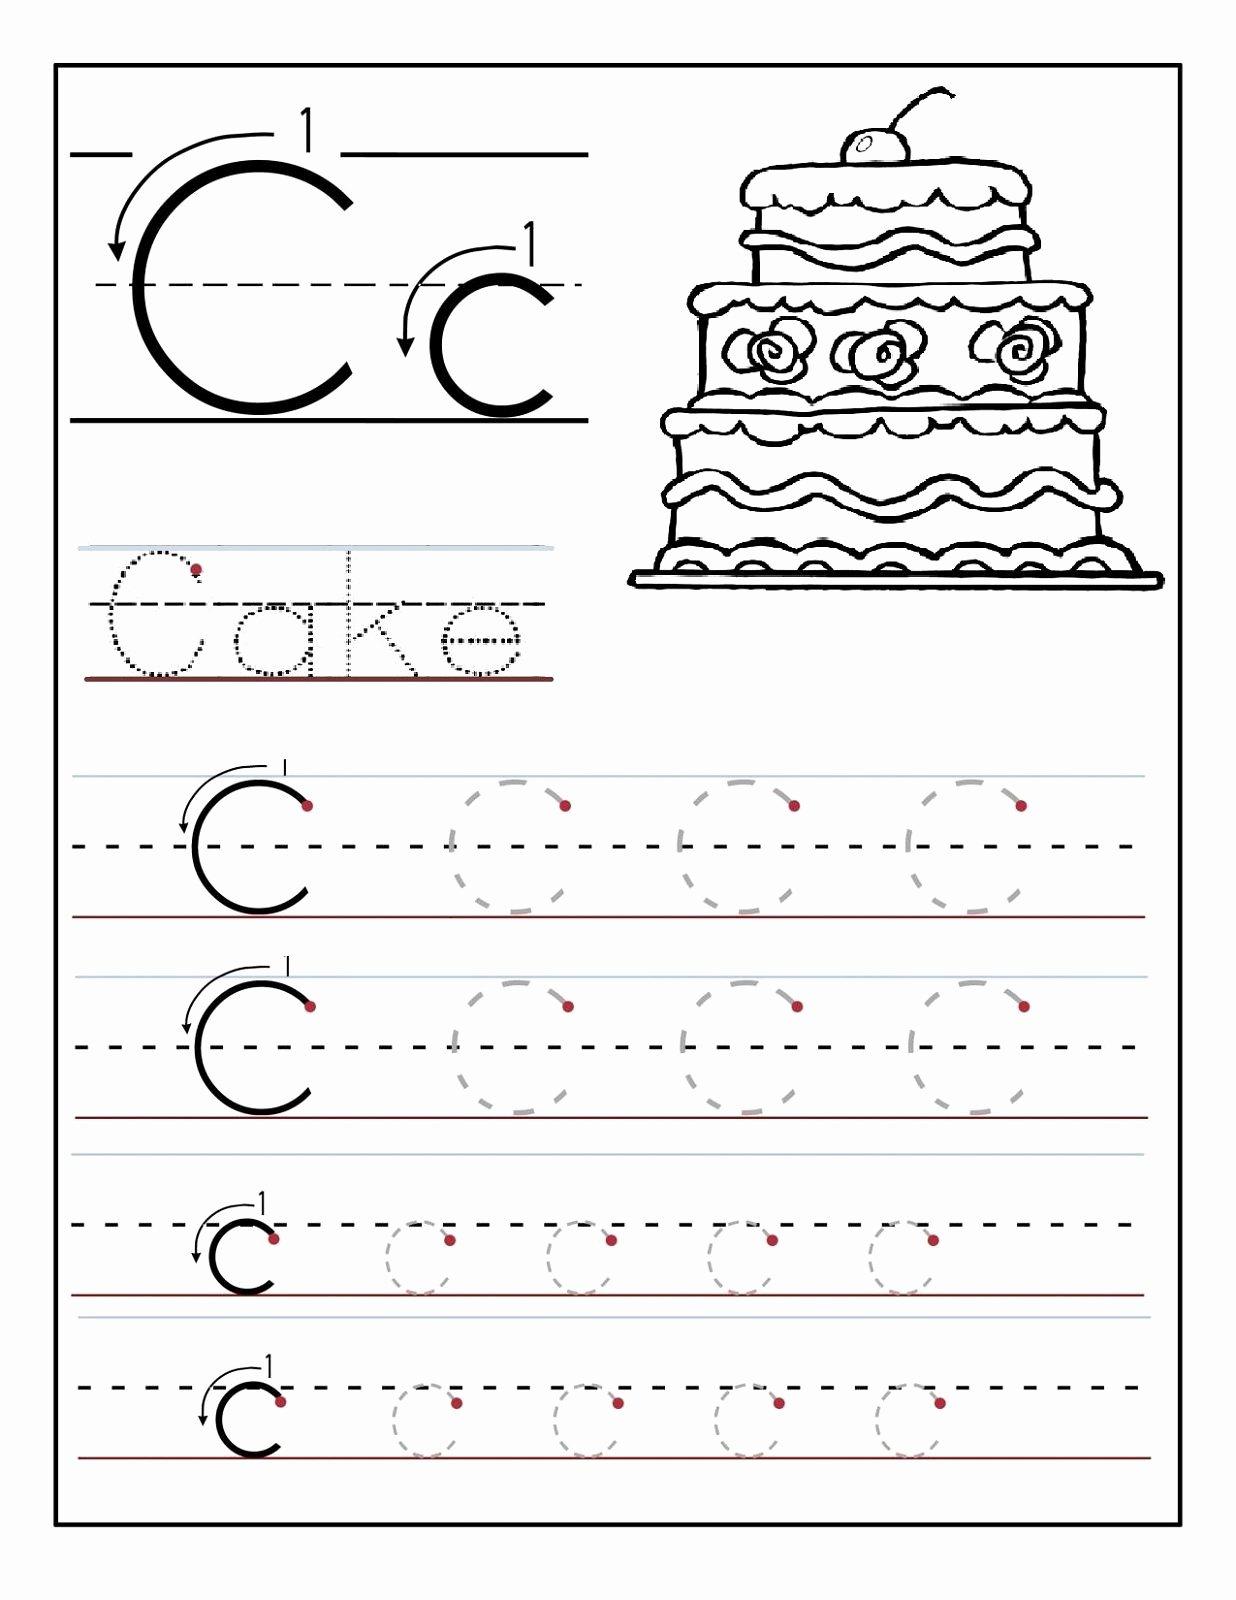 Letter C Tracing Worksheets for Preschoolers Best Of Trace the Letter C Worksheets